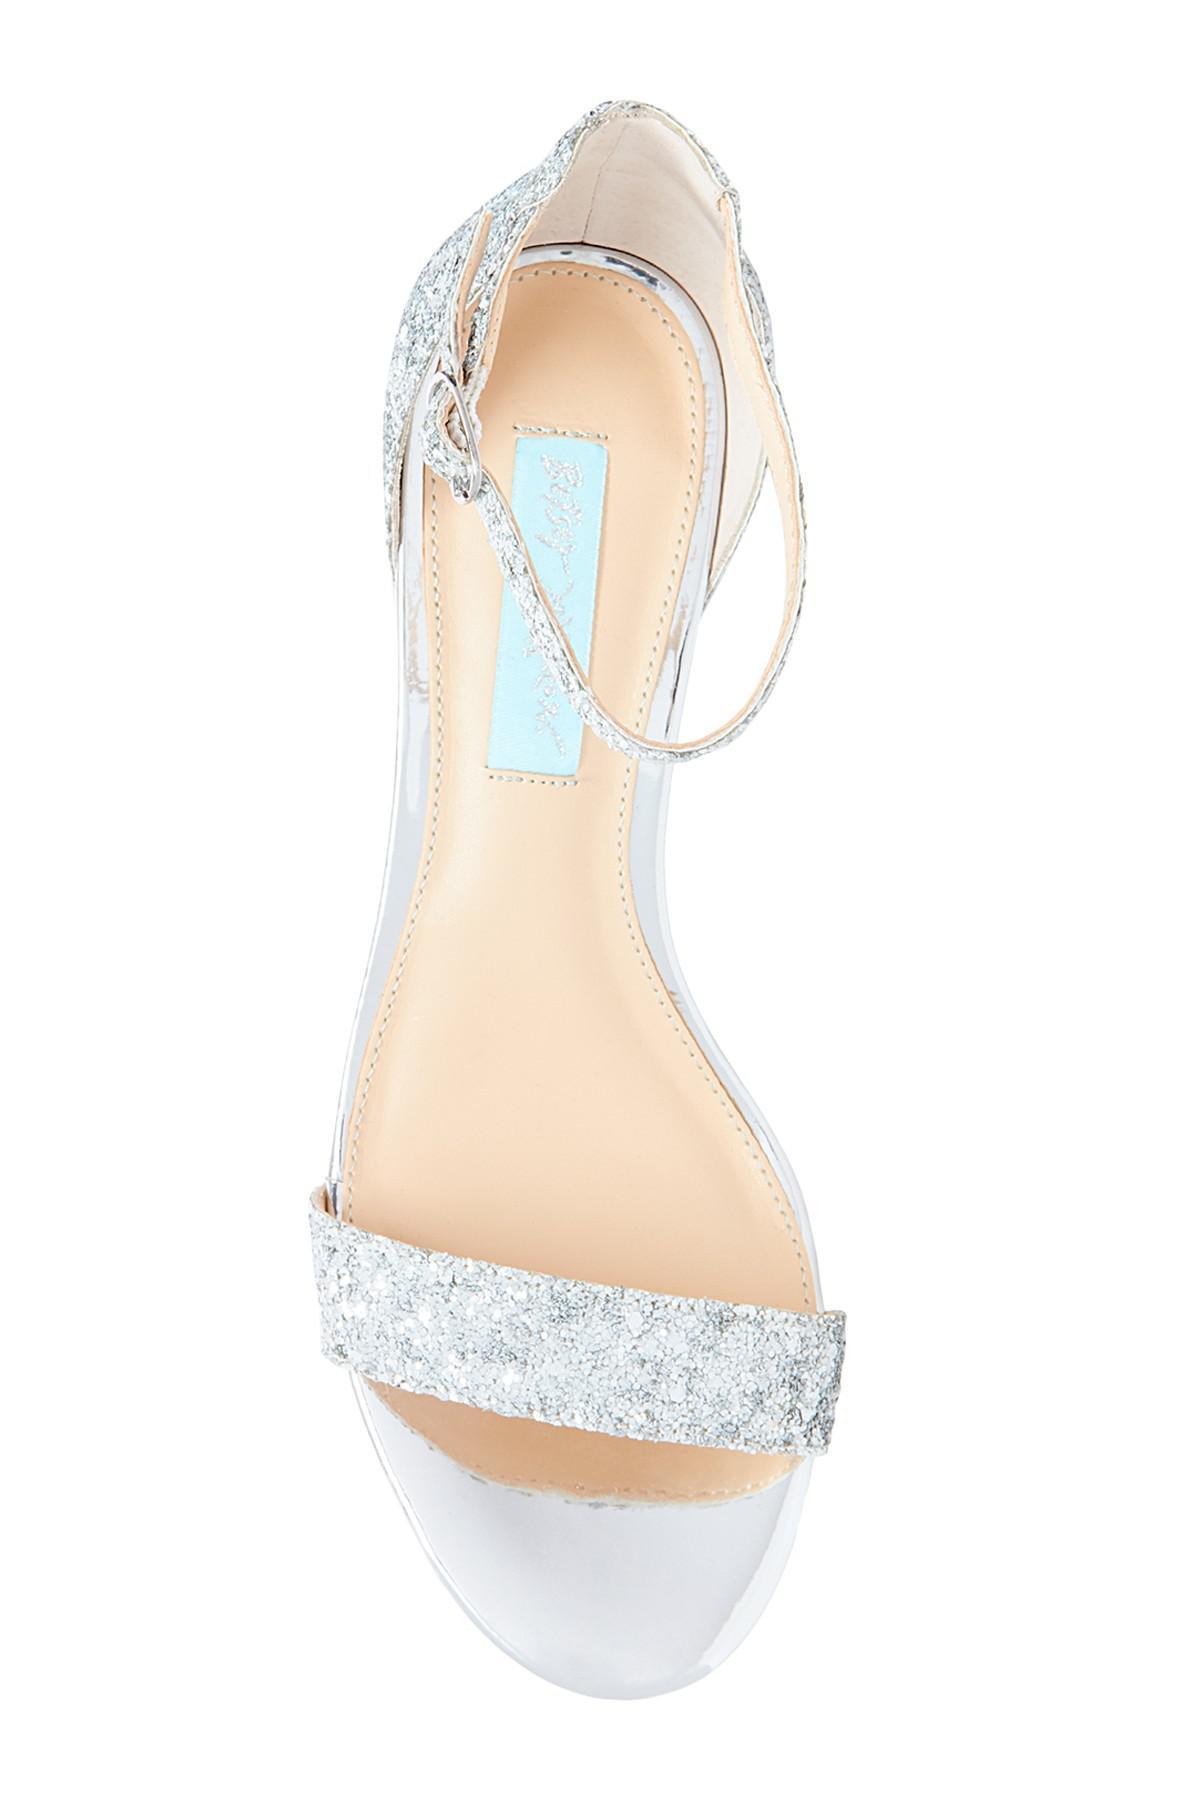 aa36a1eecd6 Lyst - Betsey Johnson Jayce Glitter Block Heel Sandal in Metallic